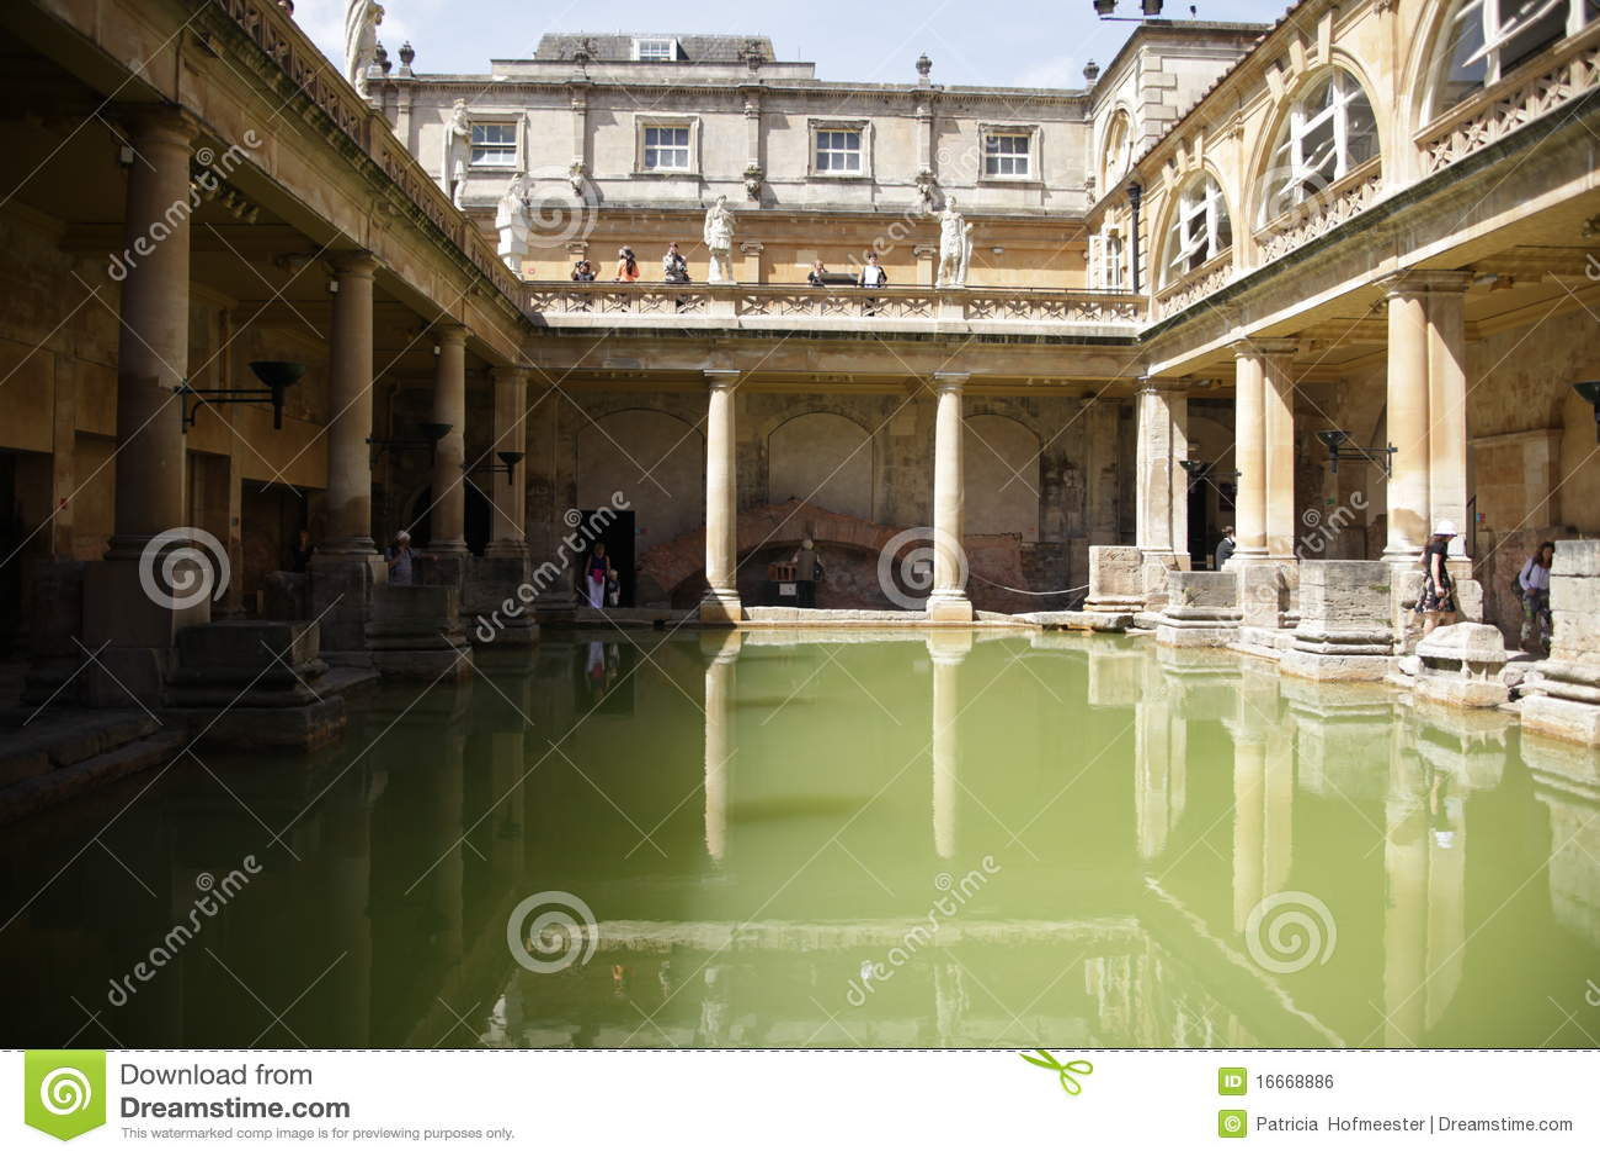 Baños Romanos Inglaterra:Patricia Hofmeester Roman Baths